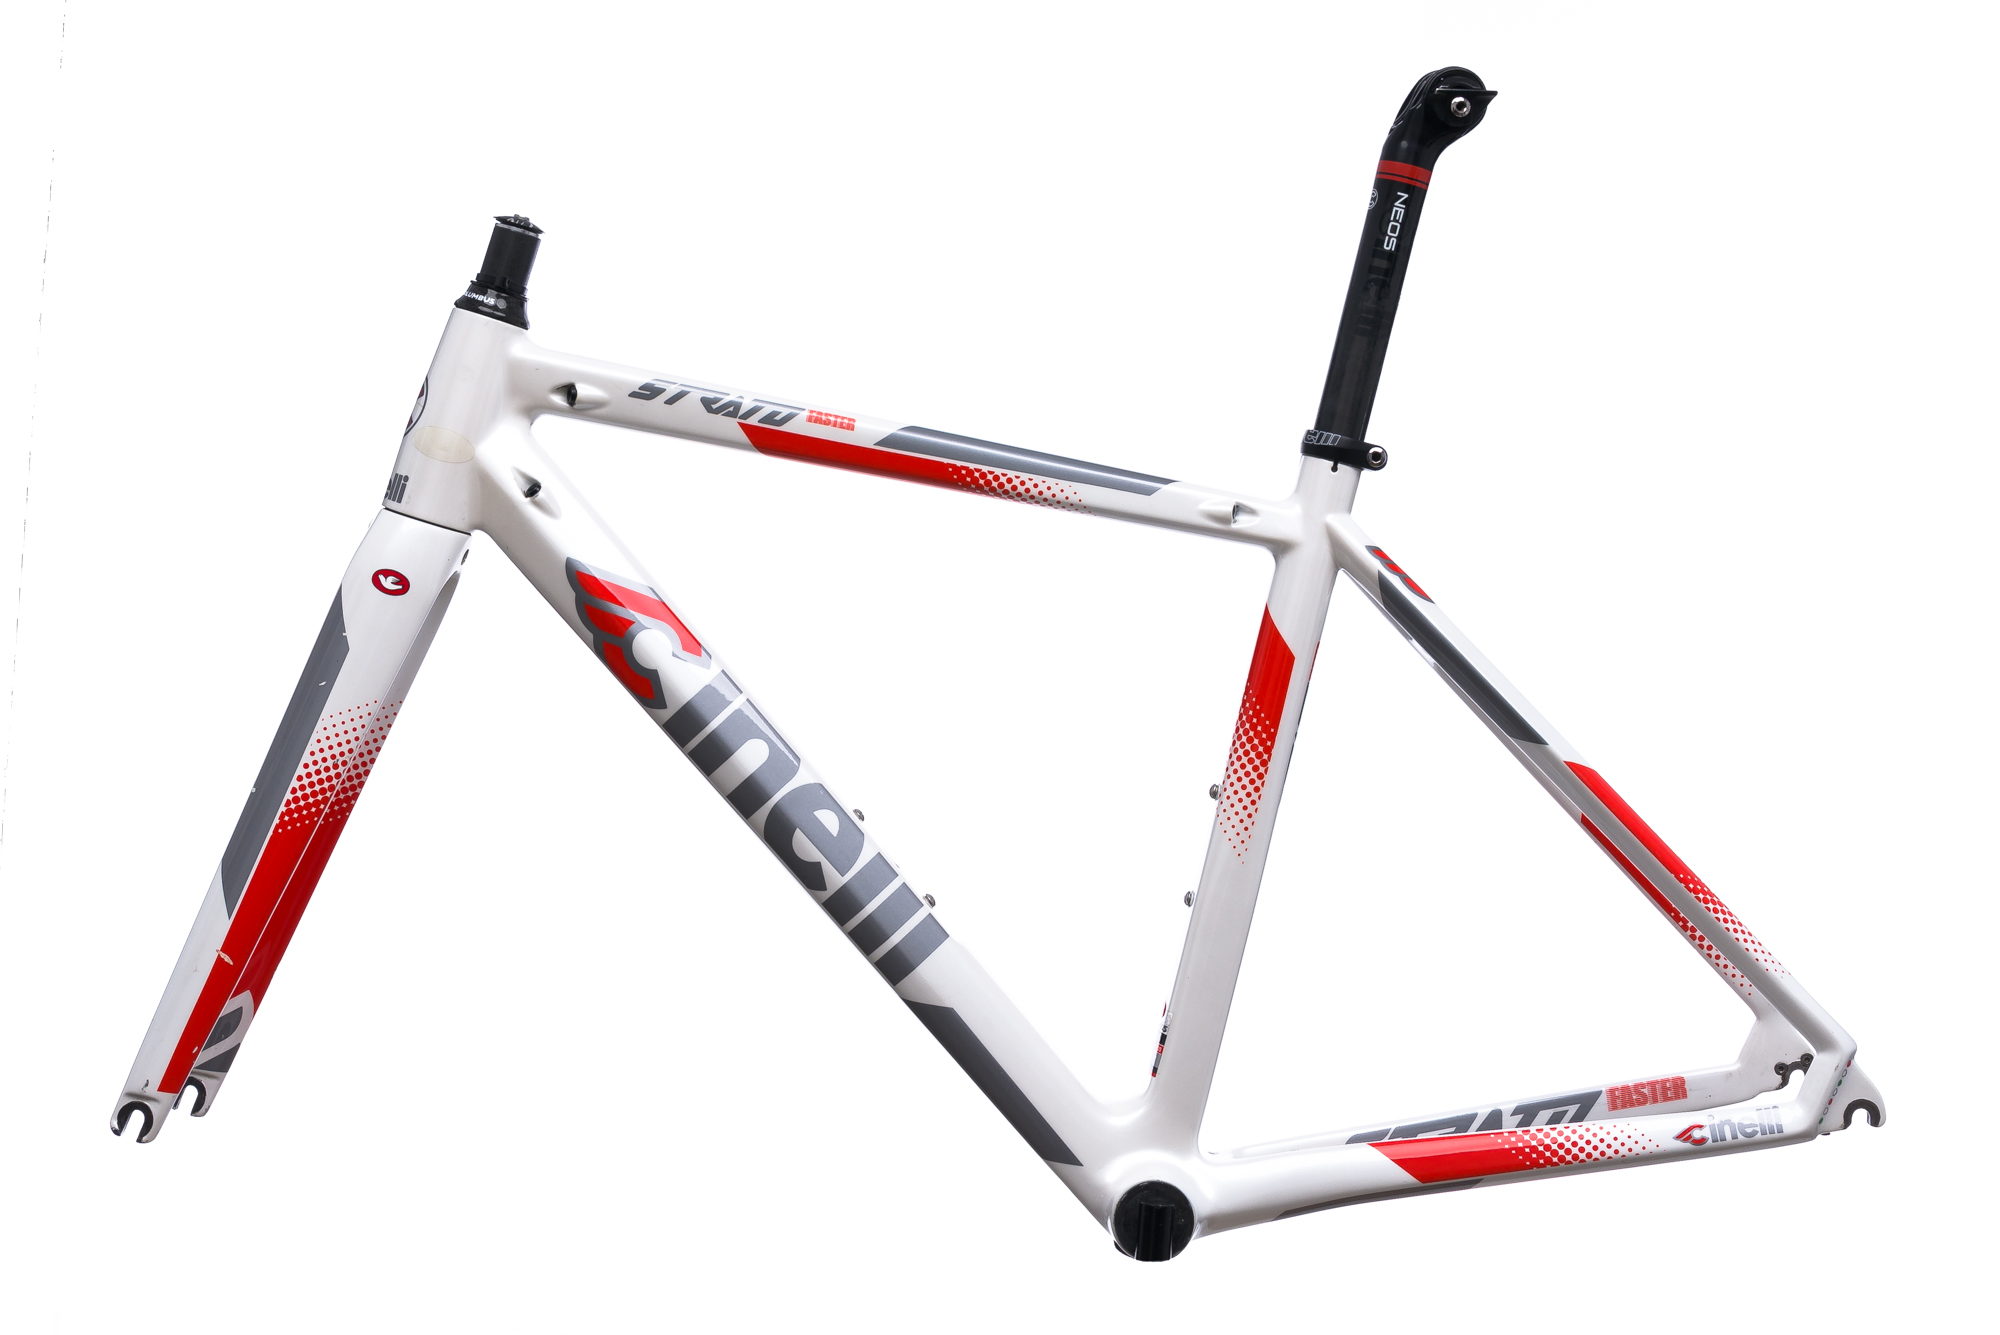 2016 Cinelli Strato Faster Road Bike Frame Set 46cm XS Carbon | eBay